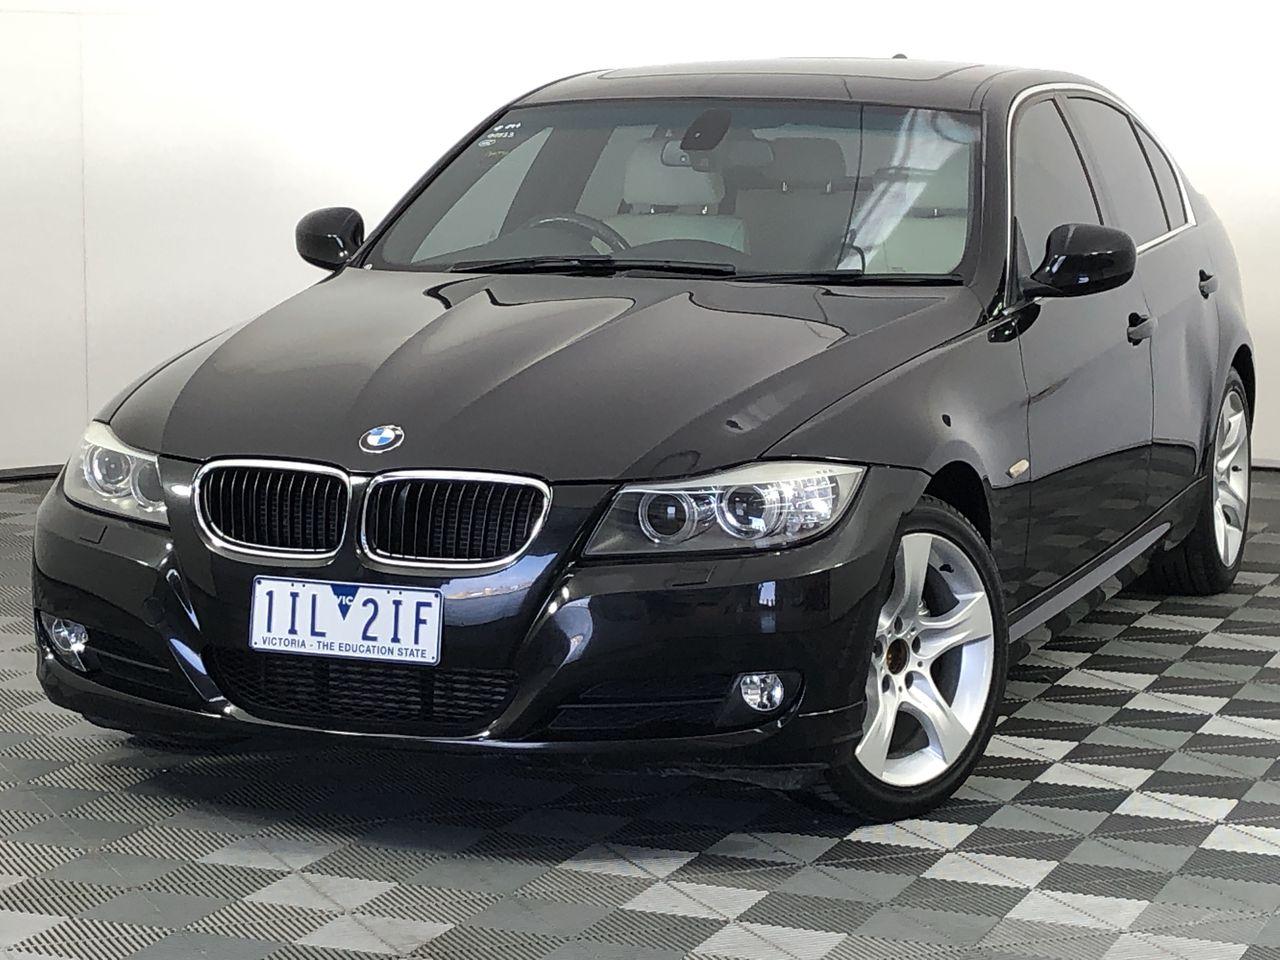 2010 BMW 3 20d EXECUTIVE E90 Turbo Diesel Automatic Sedan